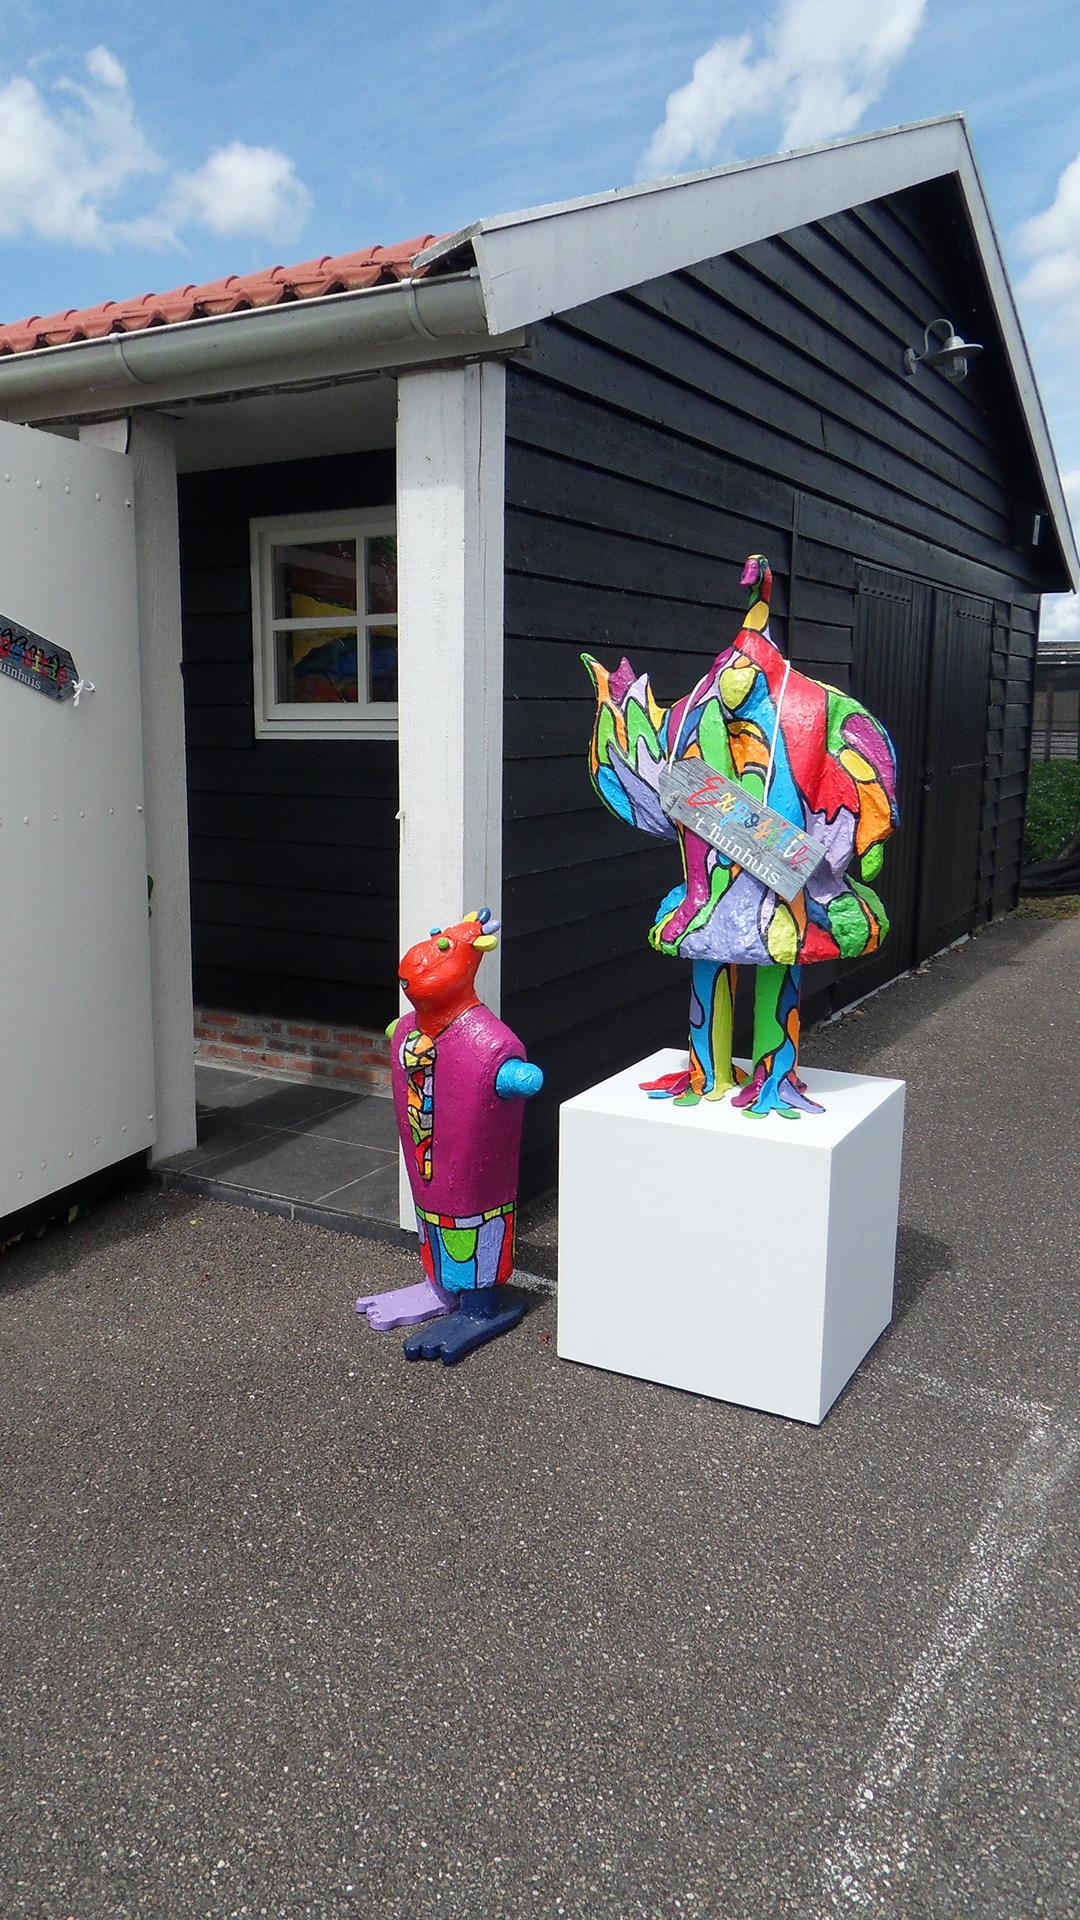 dick-binken-moderne-kunst-07